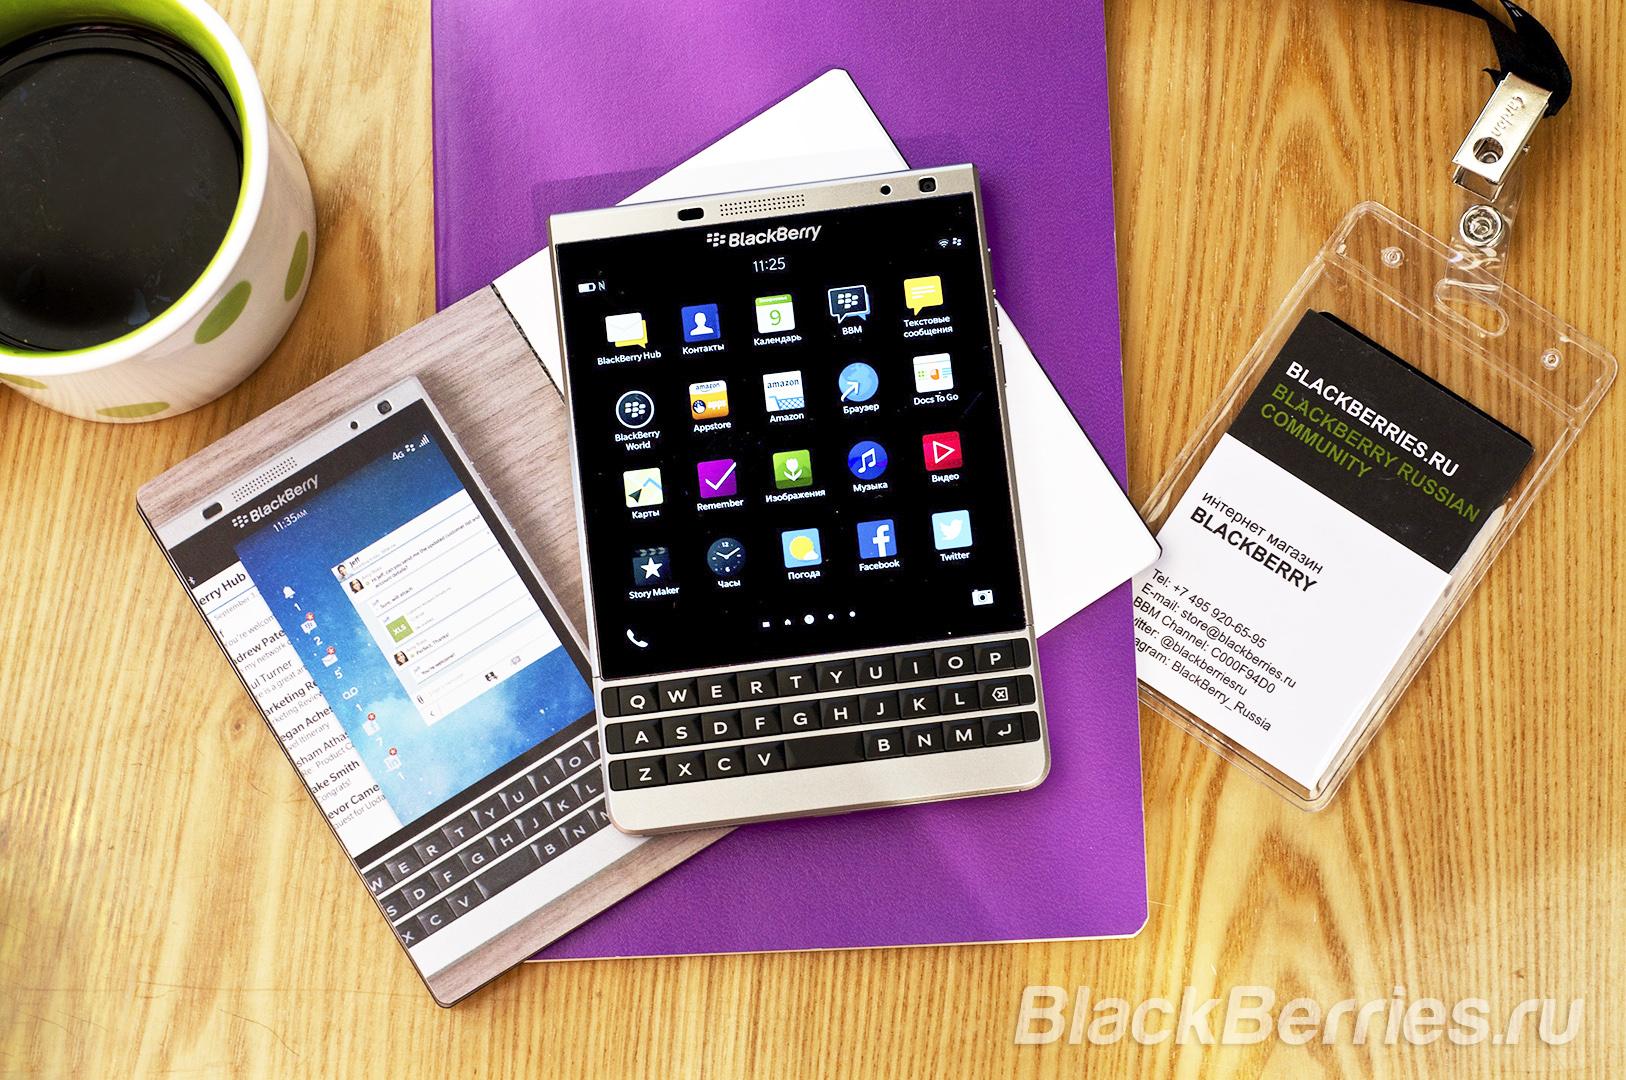 BlackBerry-Passport-Silver-Edition-Review-29